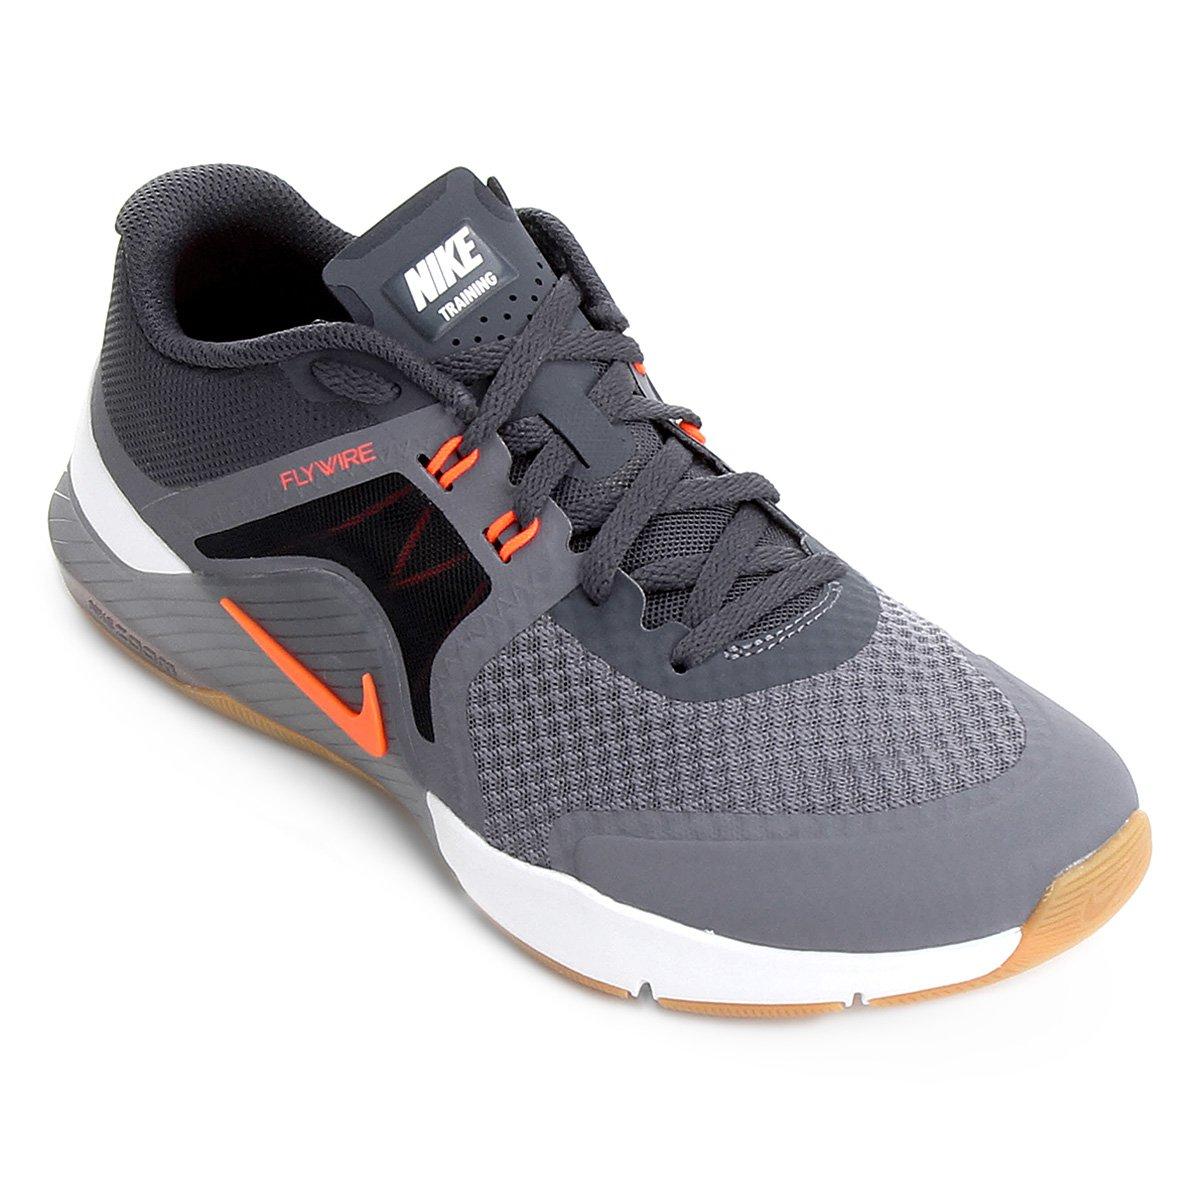 6560ead00b1 Tênis Nike Zoom Train Complete 2 Masculino - Cinza e Laranja - Compre Agora